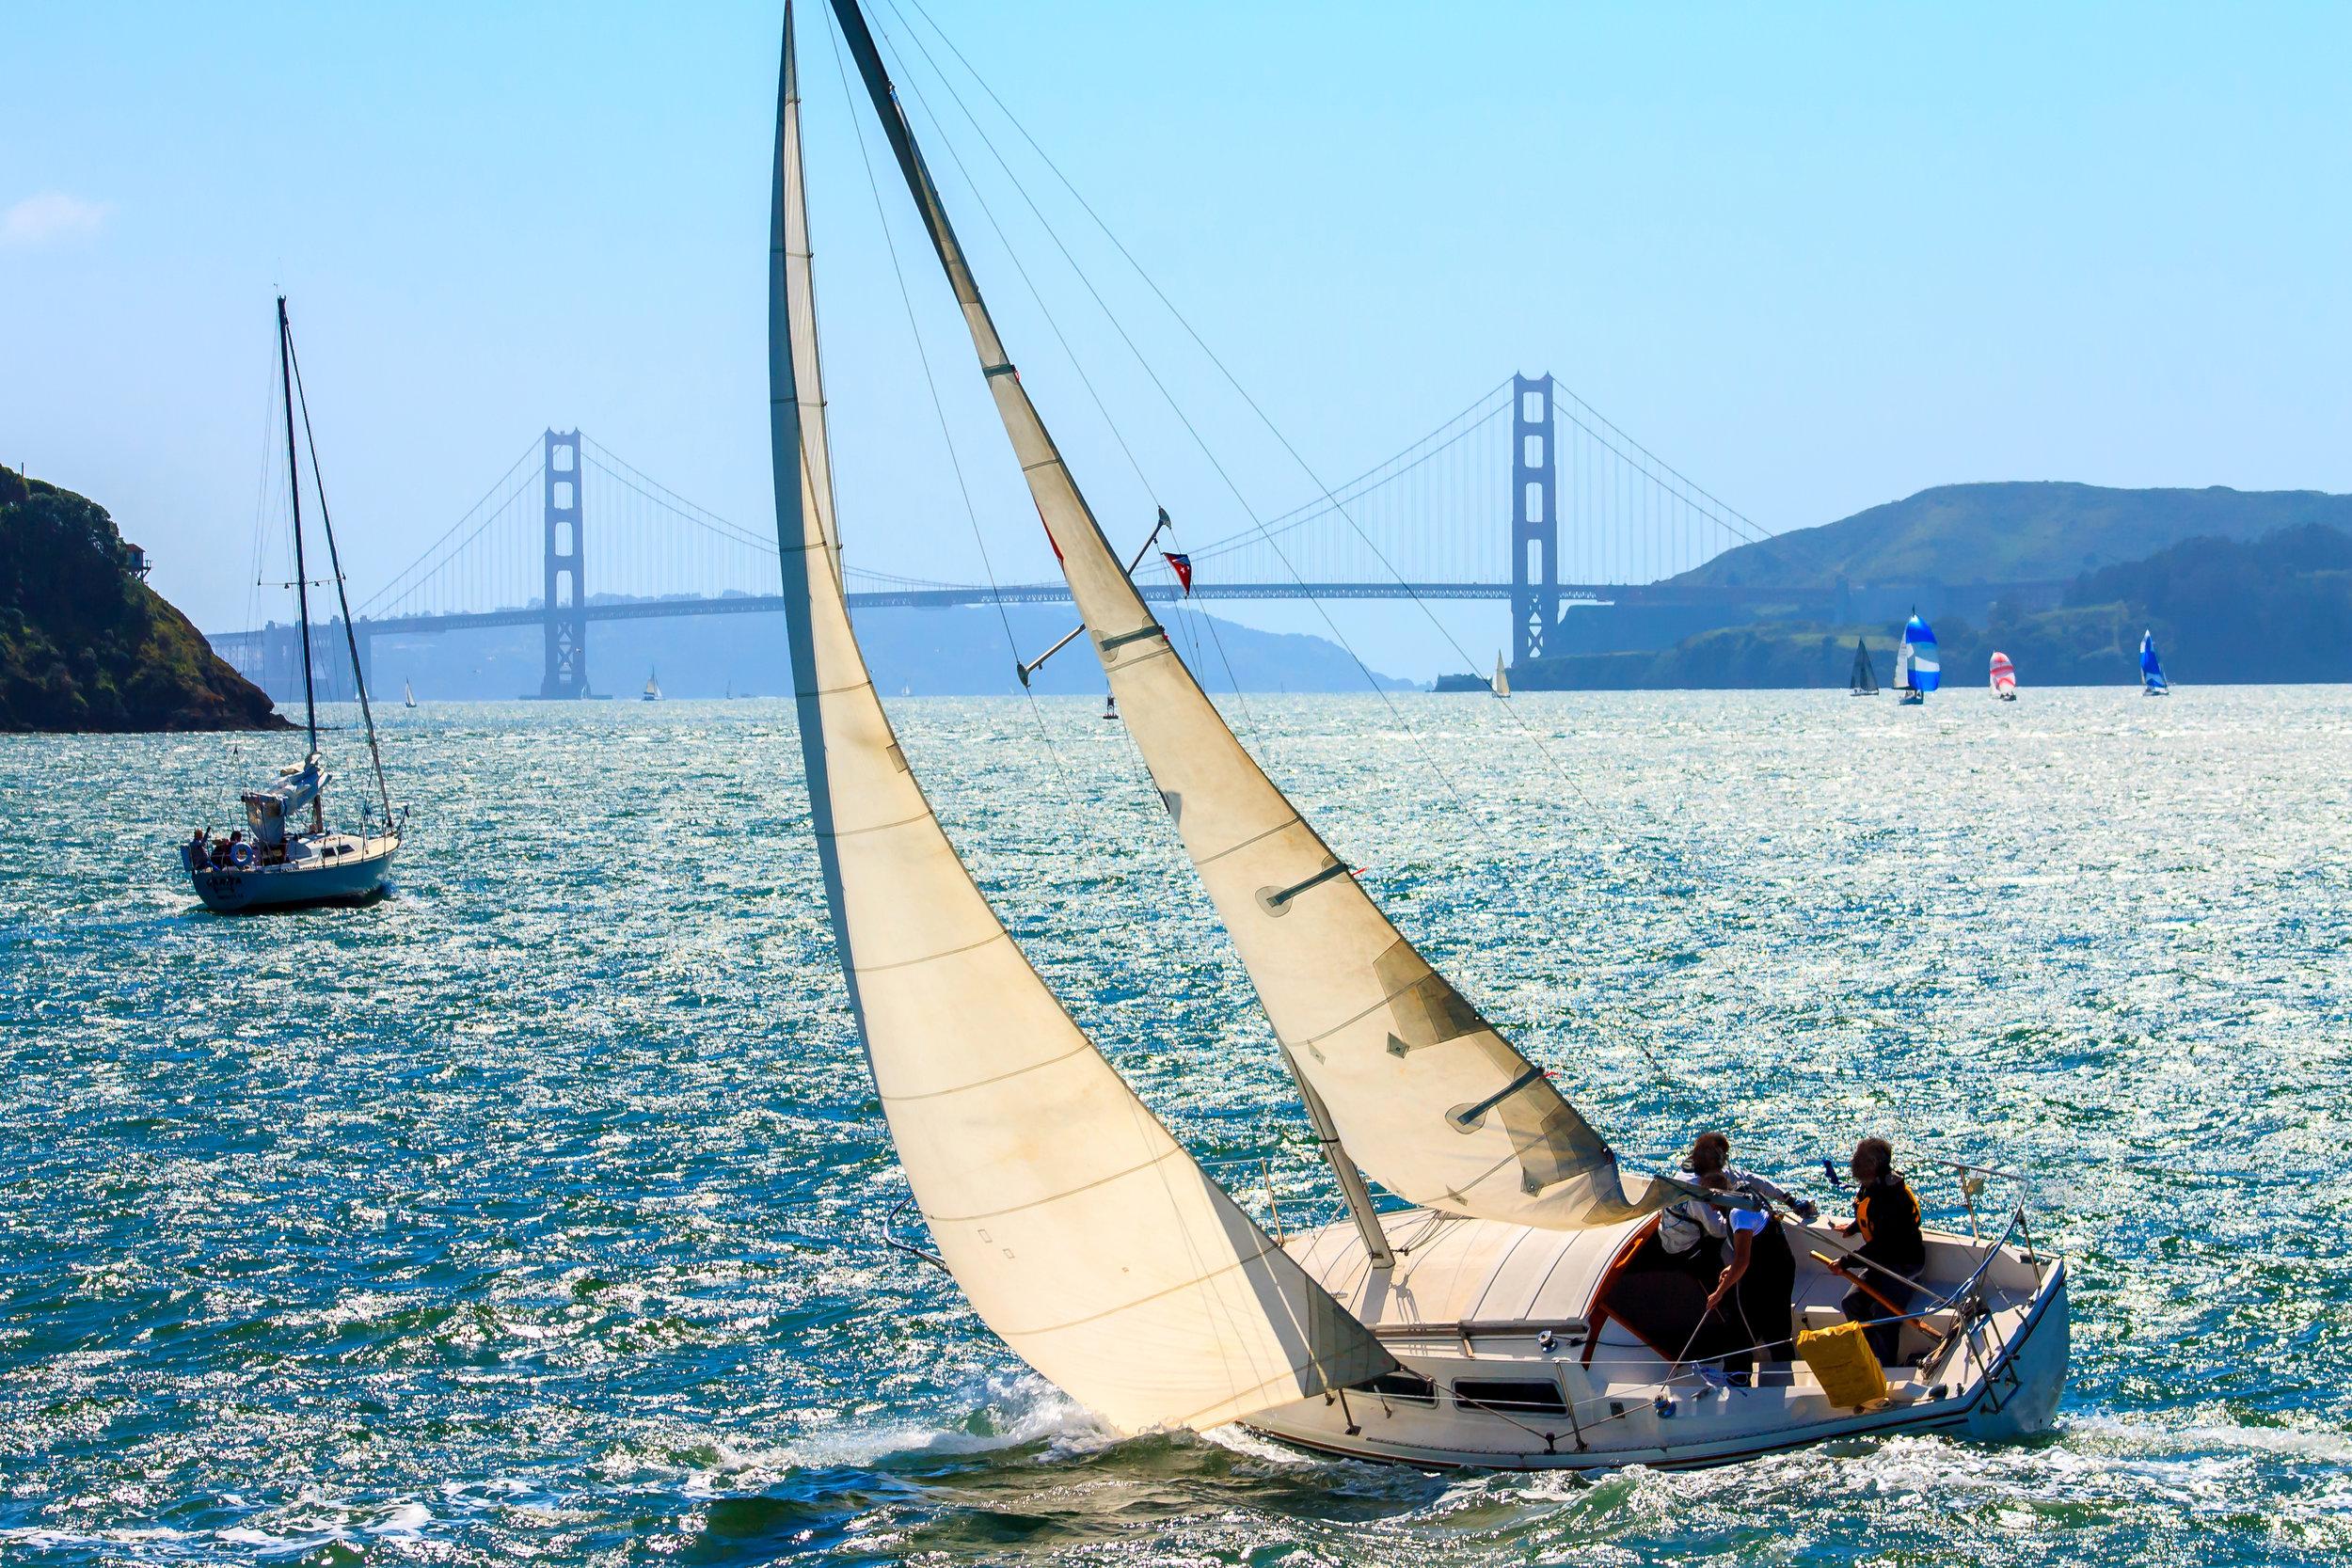 Set sail on the San Francisco Bay.